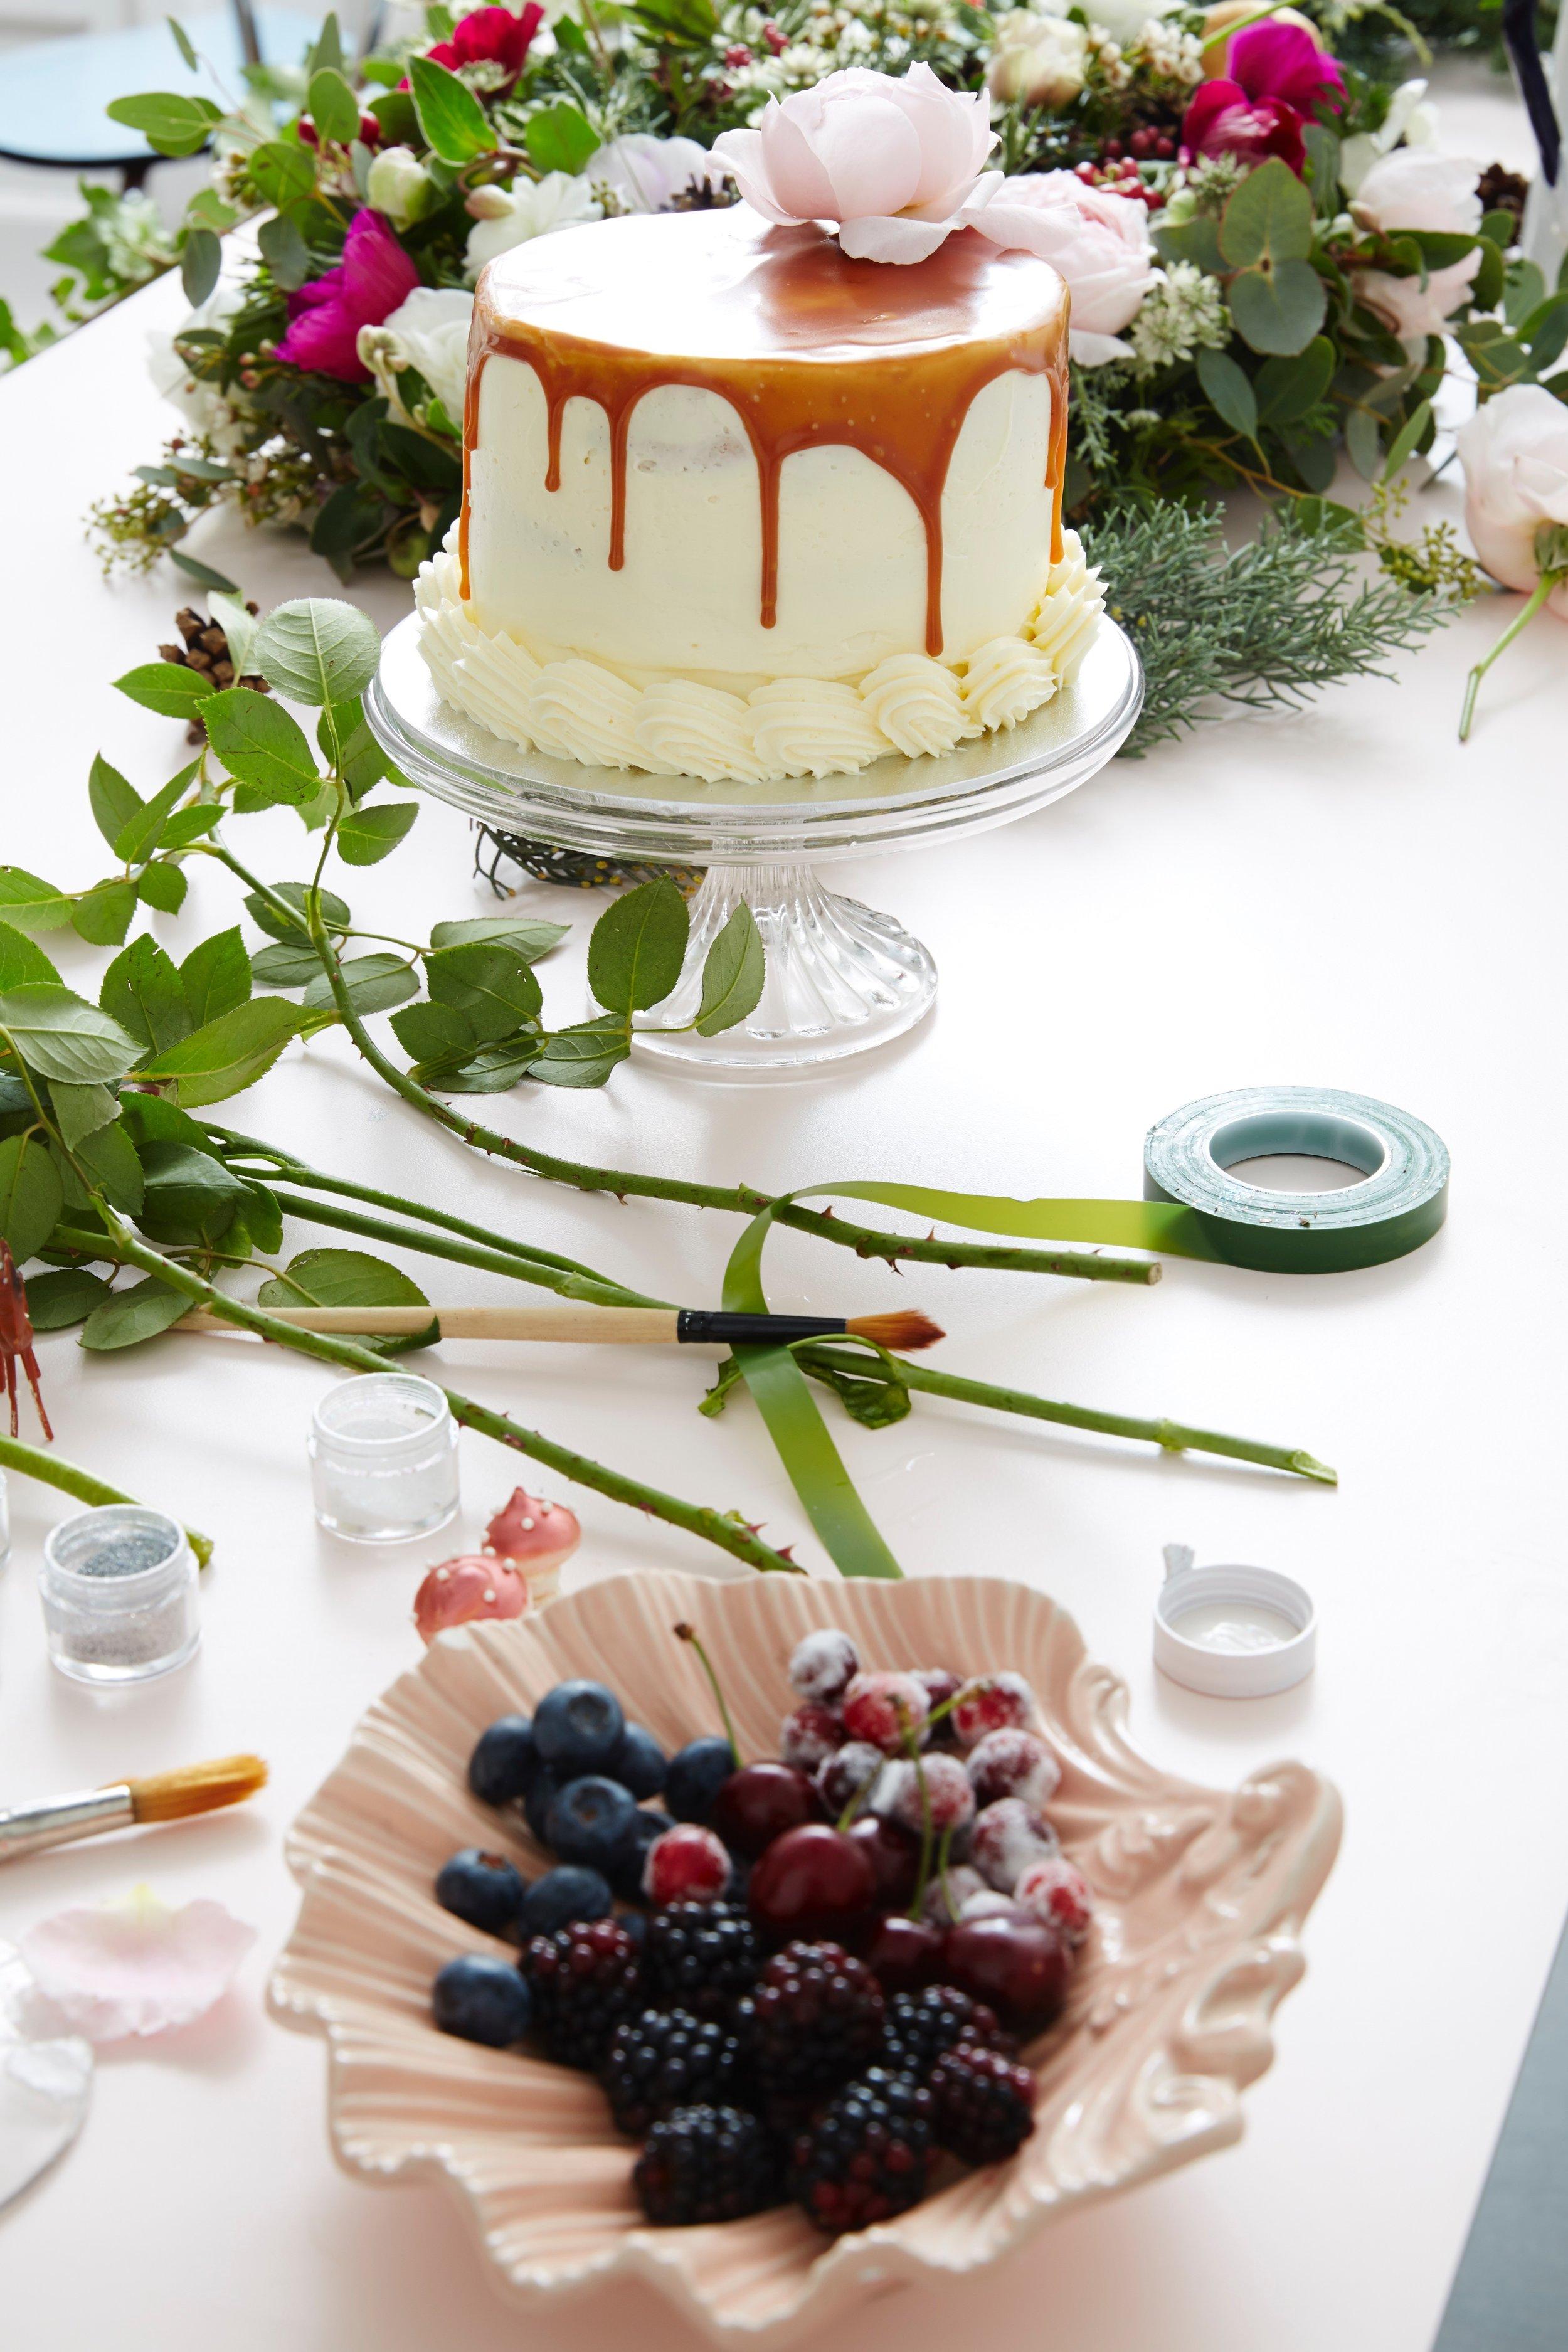 sugared cranberries drizzle cake